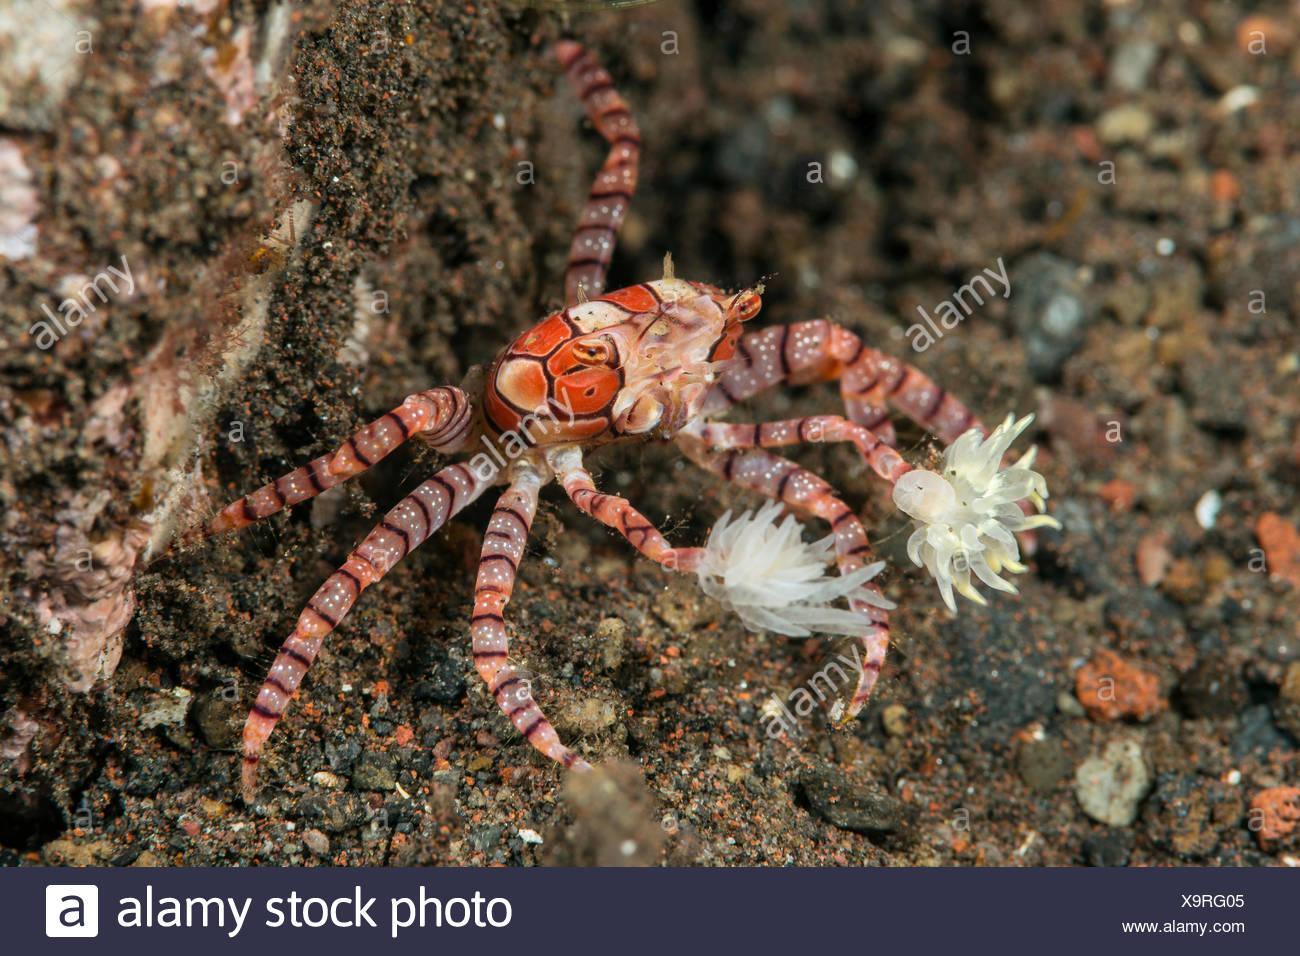 Boxer Crab, Lybia tessellata, Bali, Indonesia - Stock Image